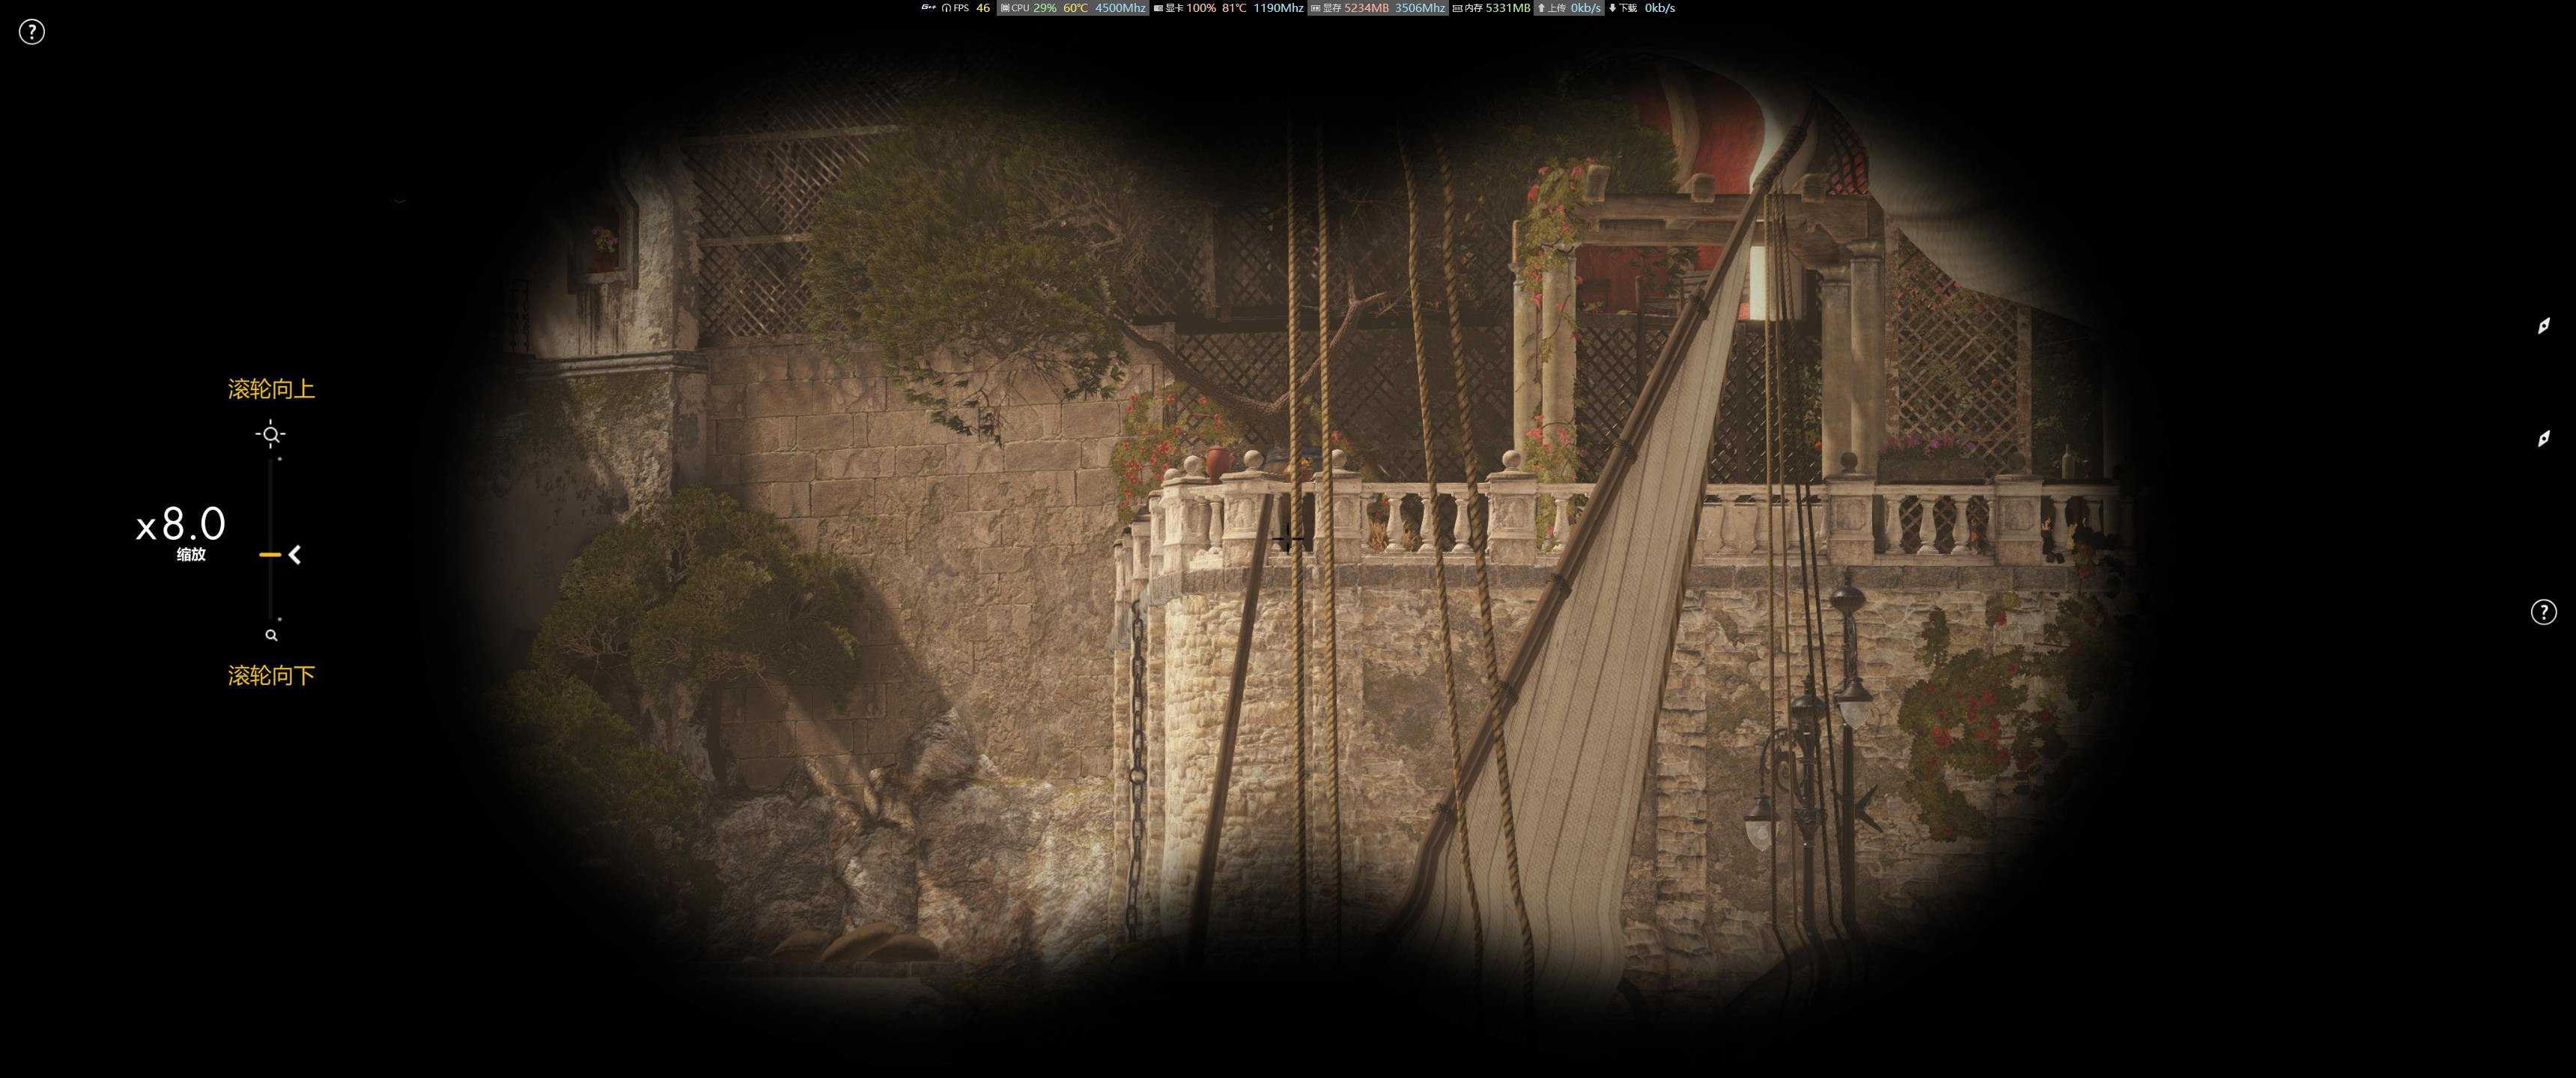 SniperElite4_DX11-25-12-42-54.jpg